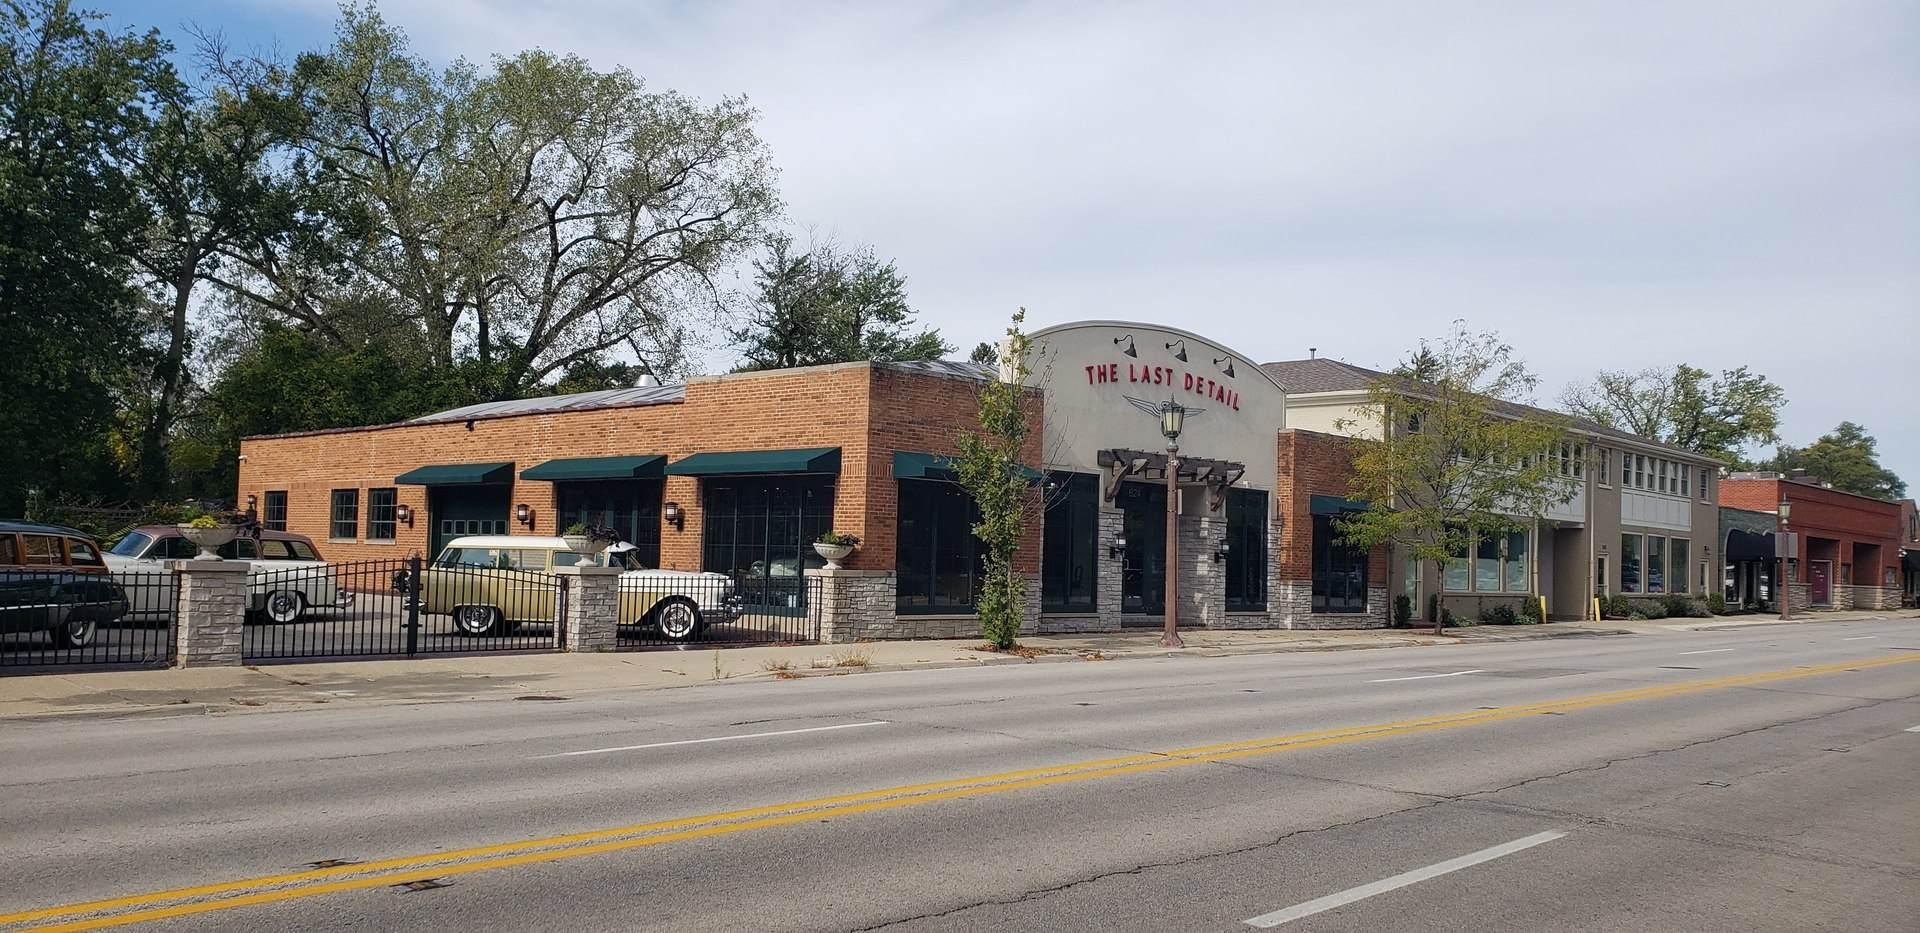 624 Green Bay Road, Kenilworth, IL 60043 (MLS #10932373) :: Lewke Partners